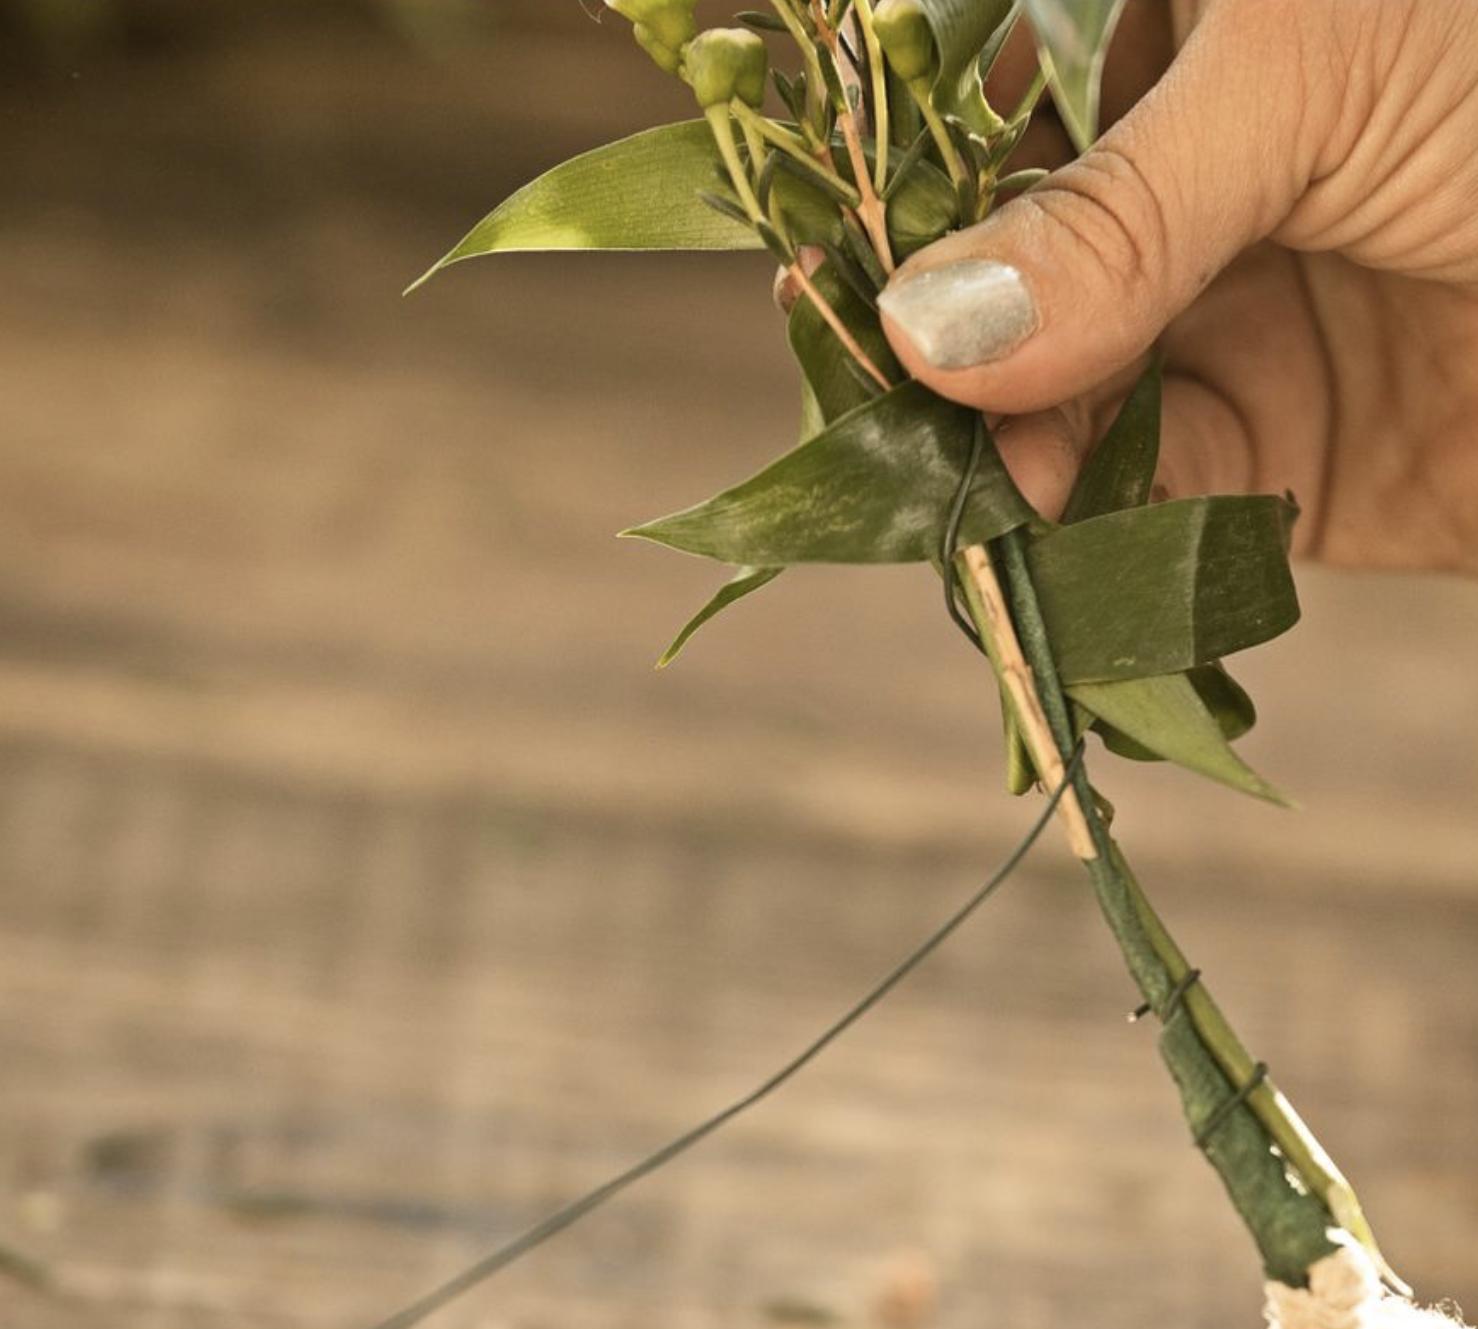 florist-tools-florist-wire